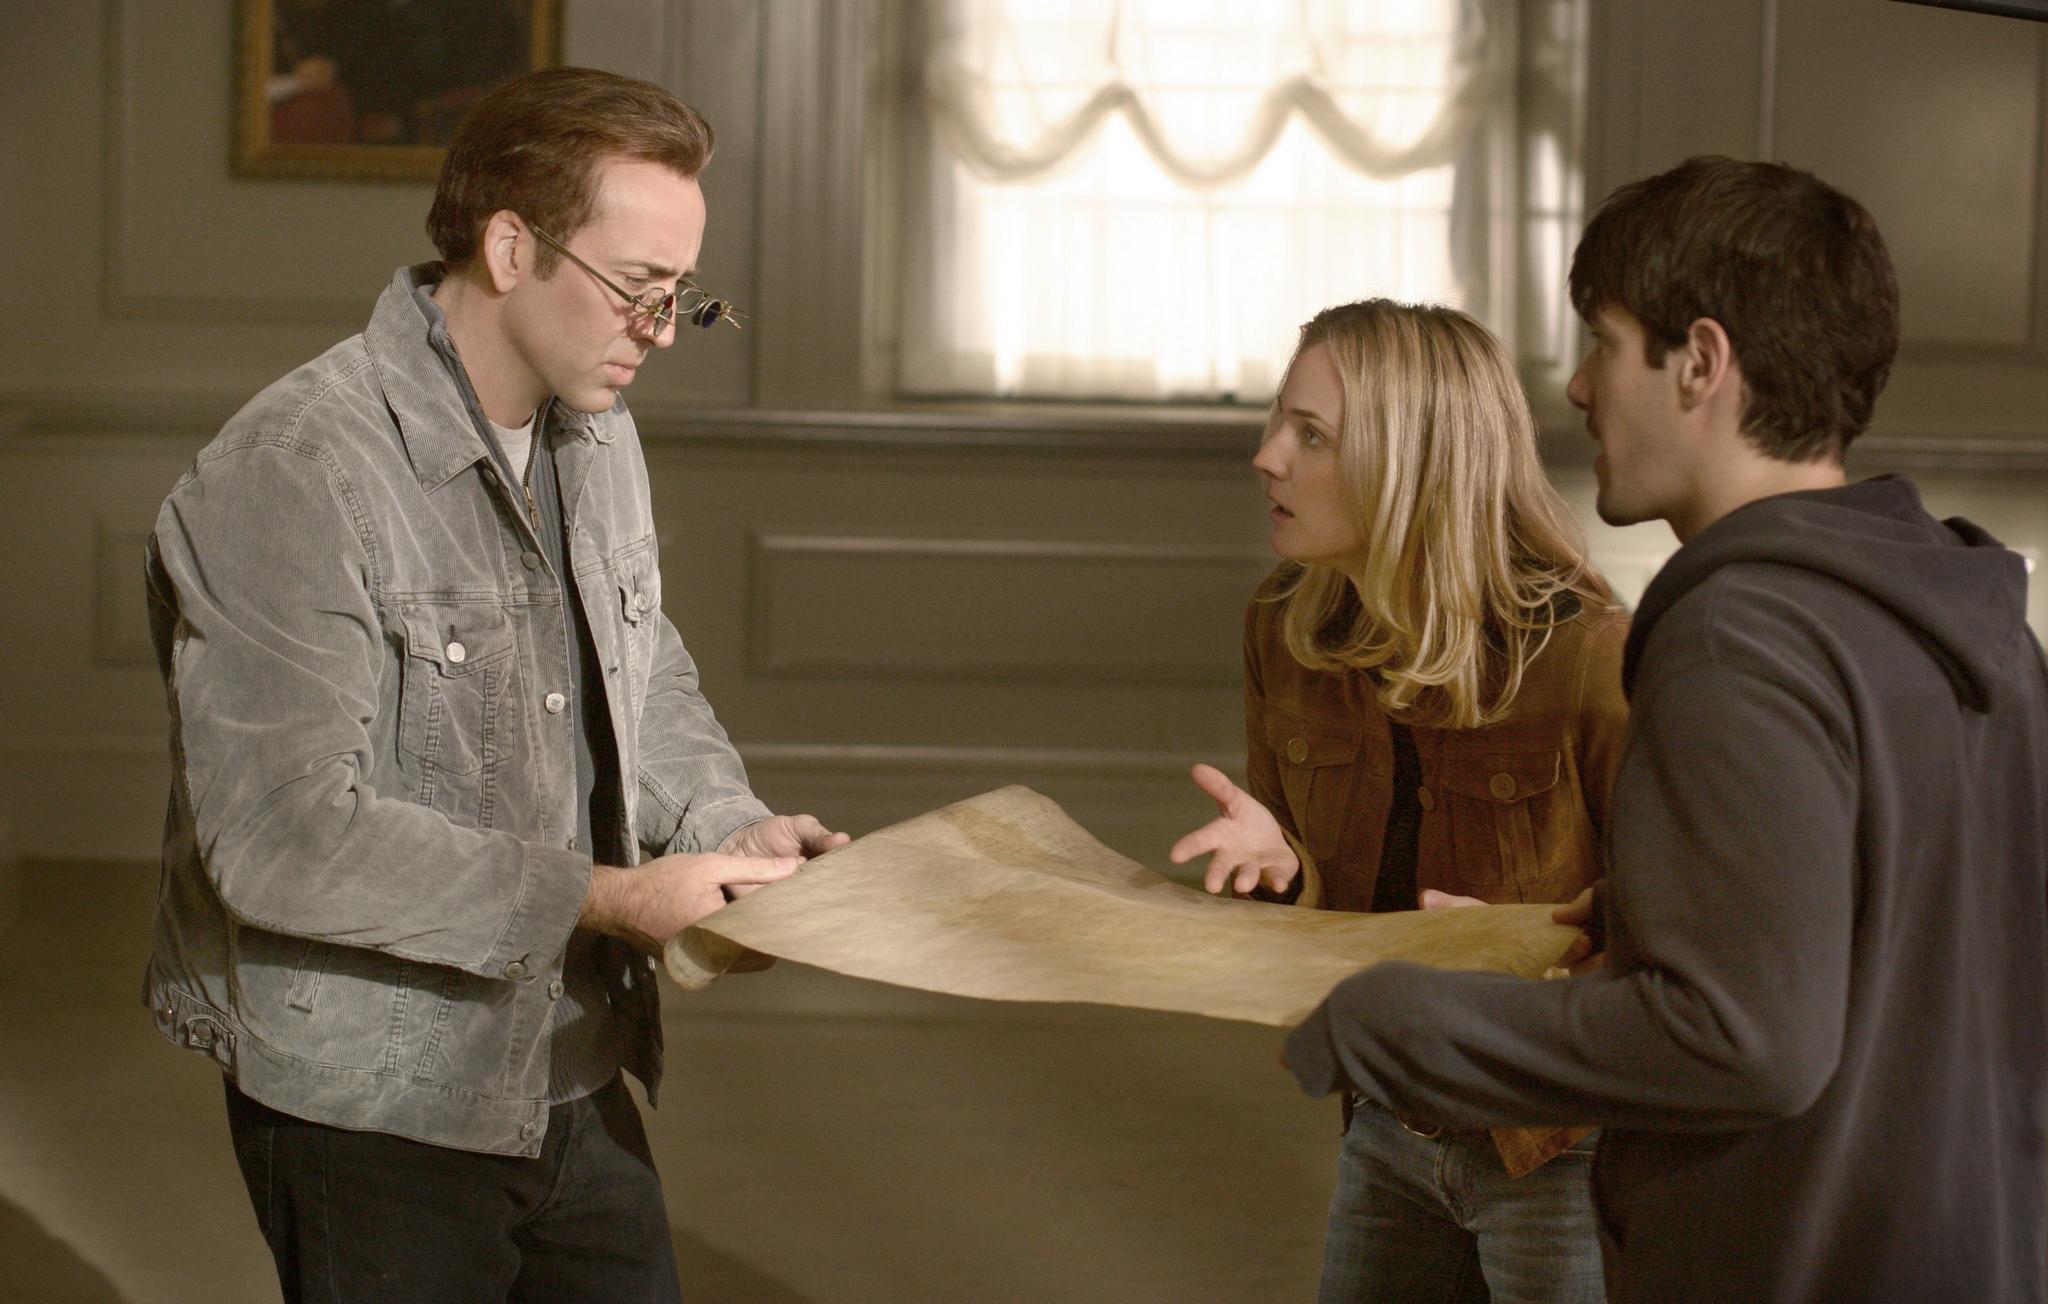 Nicolas Cage, Justin Bartha, and Diane Kruger in National Treasure (2004)